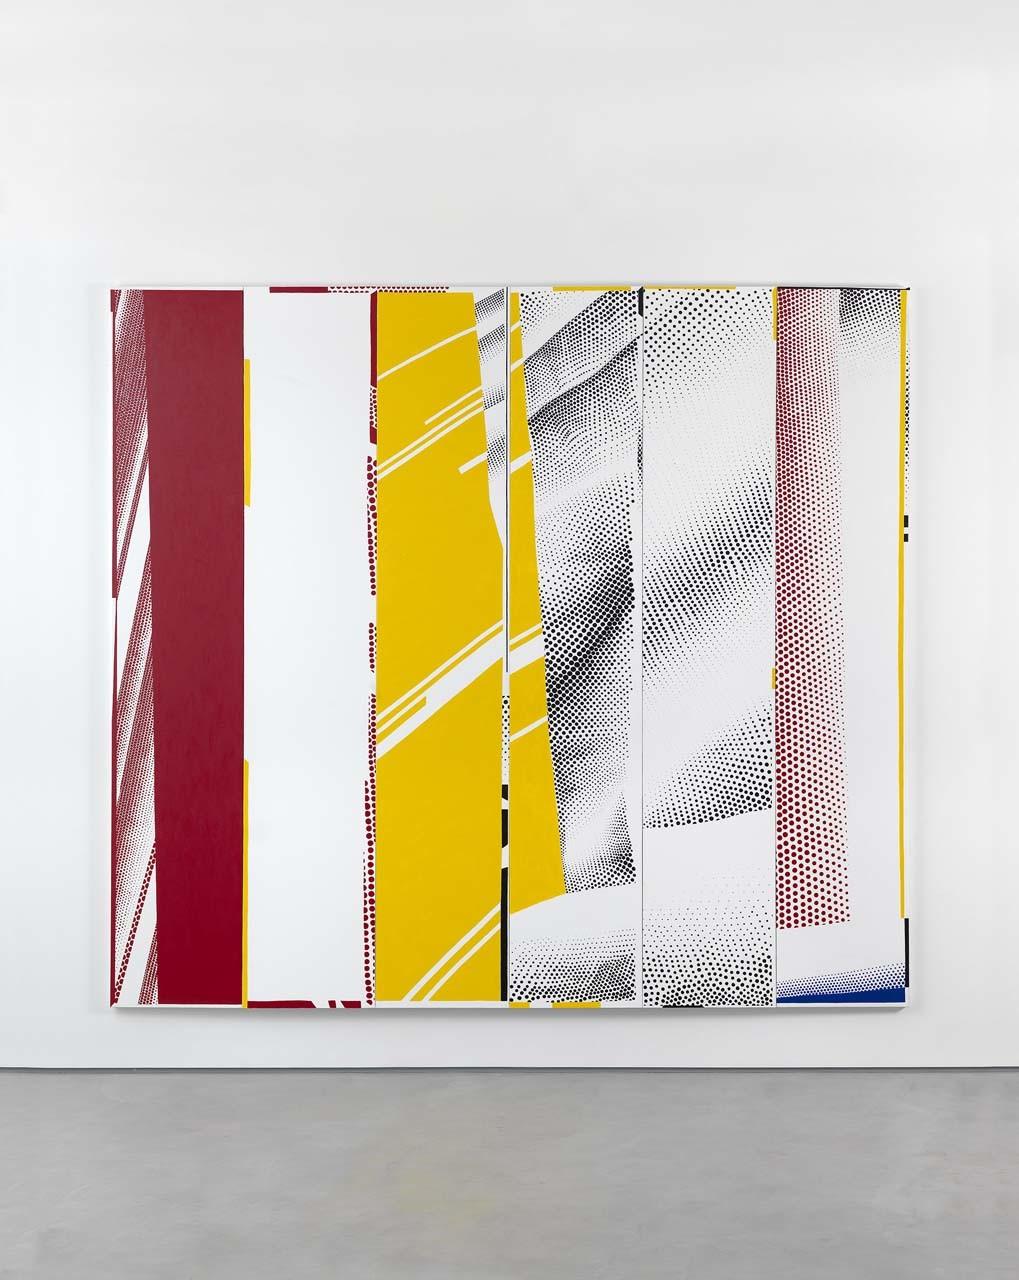 "<div class=""artwork_caption""><p>Group Self-portrait in ""Mirror #3 (Six Panels)"" (Li Huan, Jacob, Ian, Cathleen, Dom, Karin), 2015</p></div>"